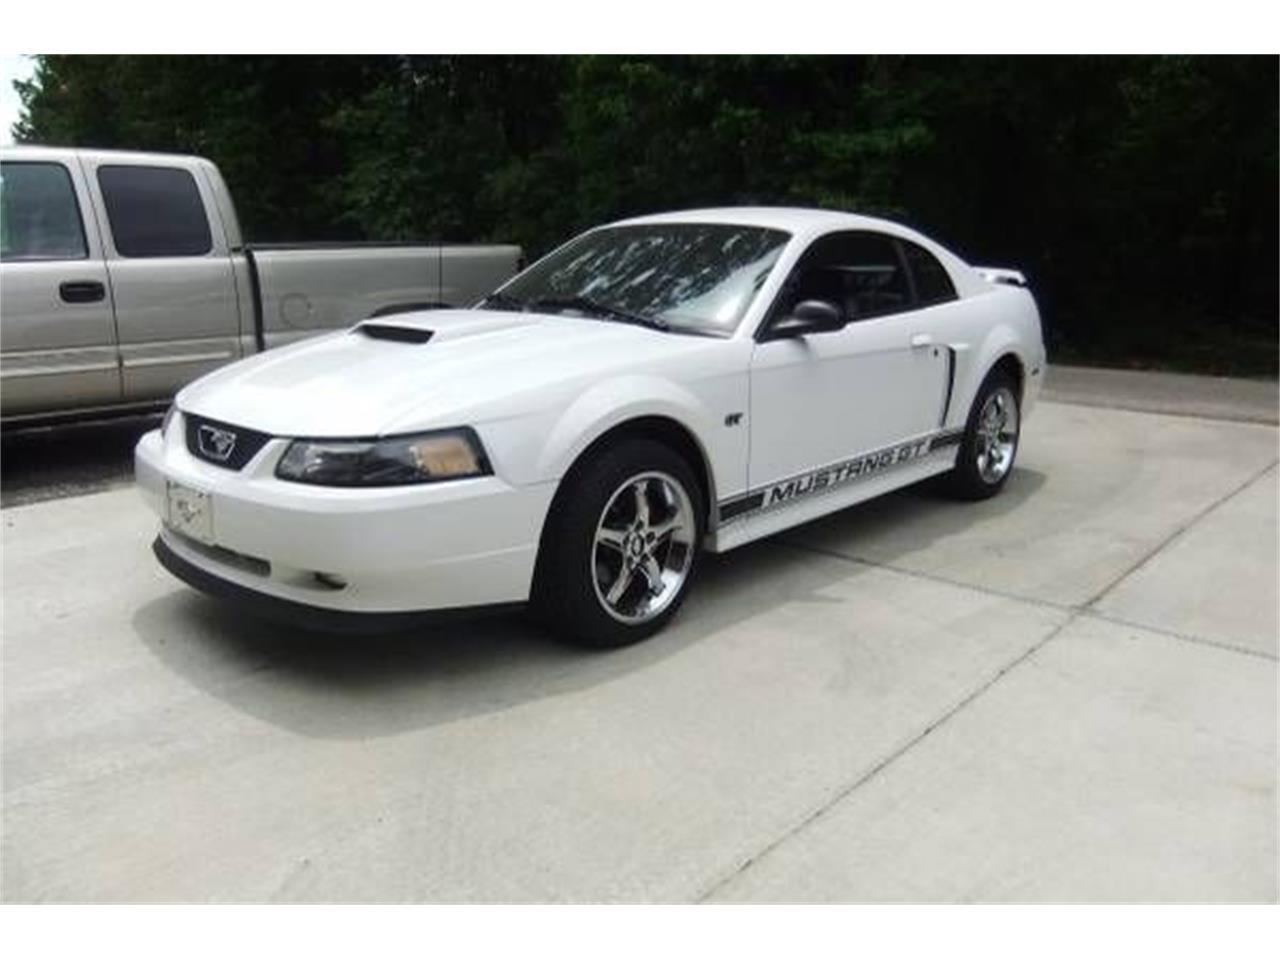 Mustang 2001